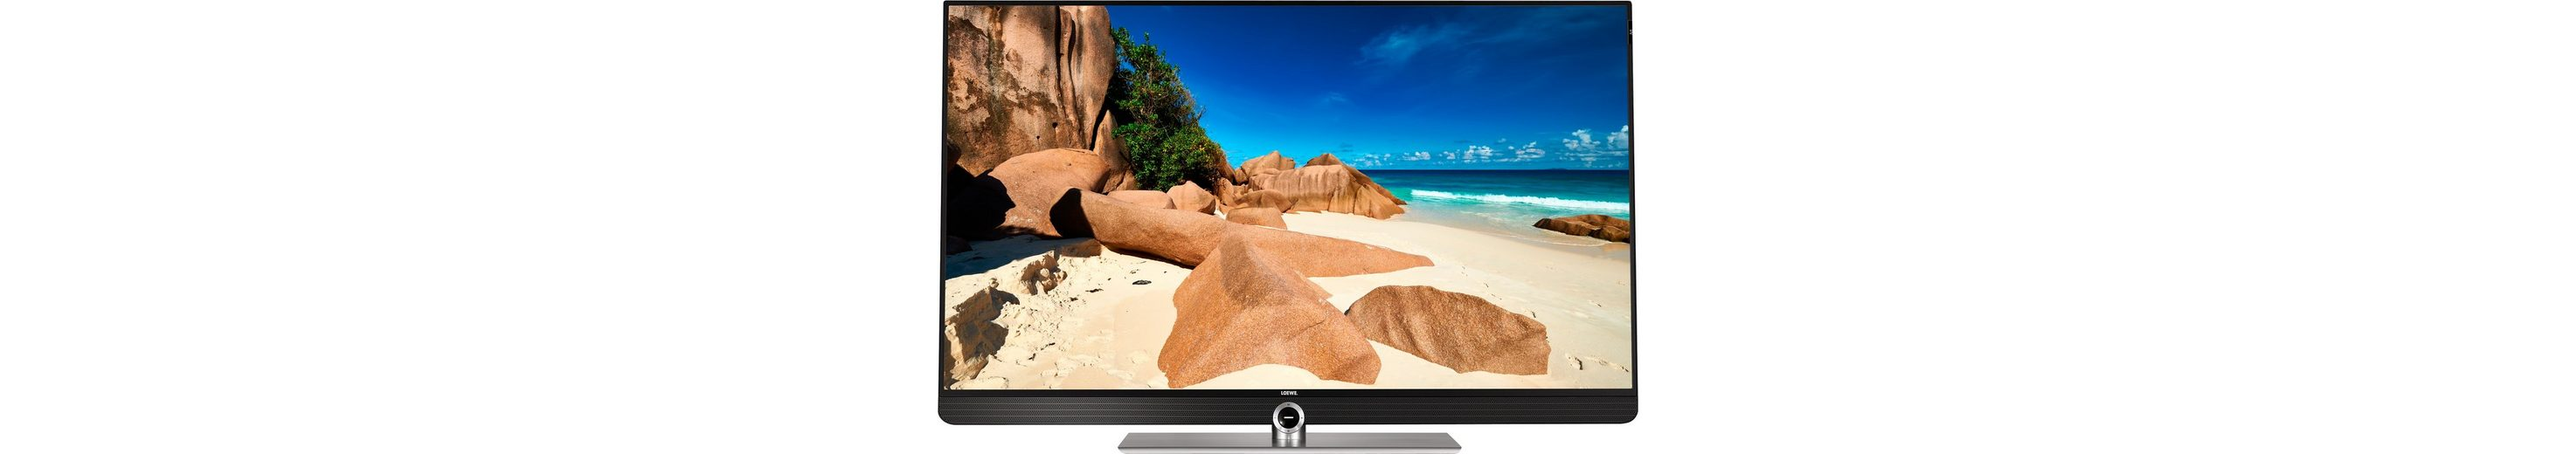 Loewe Art 40, LED Fernseher, 102 cm (40 Zoll), 2160p (4K Ultra HD)